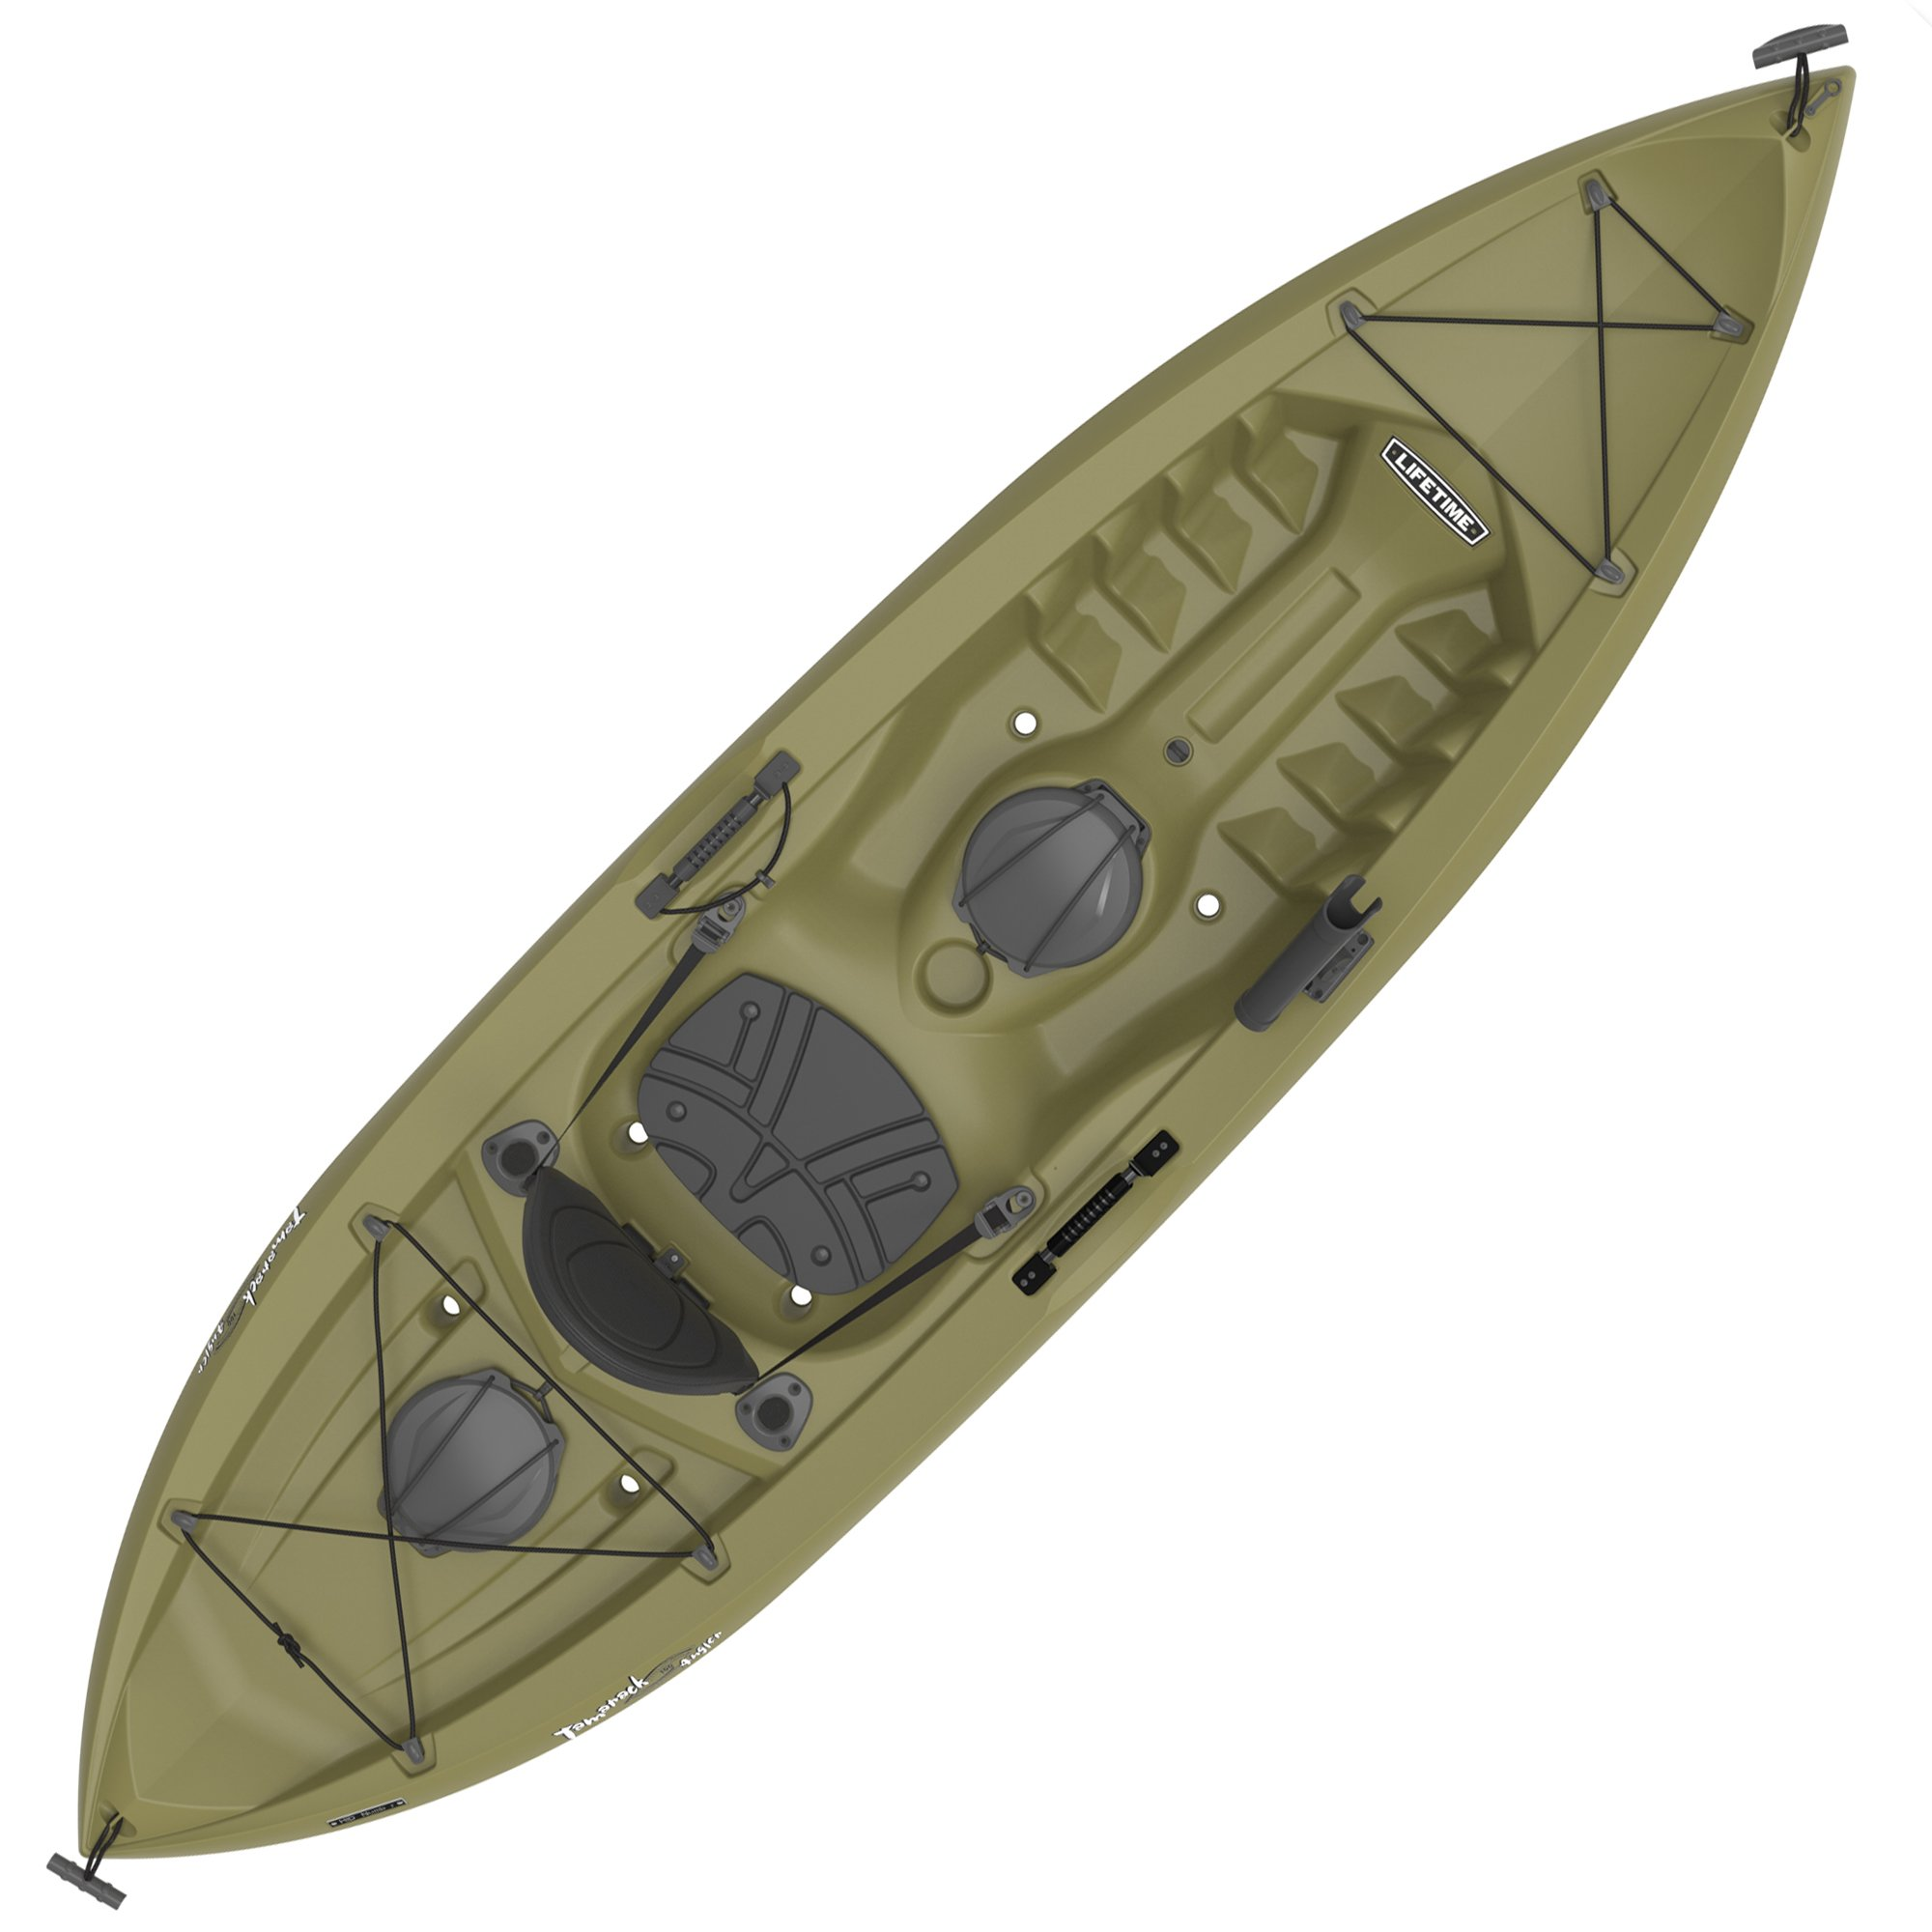 Lifetime Tamarack Angler Sit-On-Top Kayak, Olive, 120'' by Lifetime